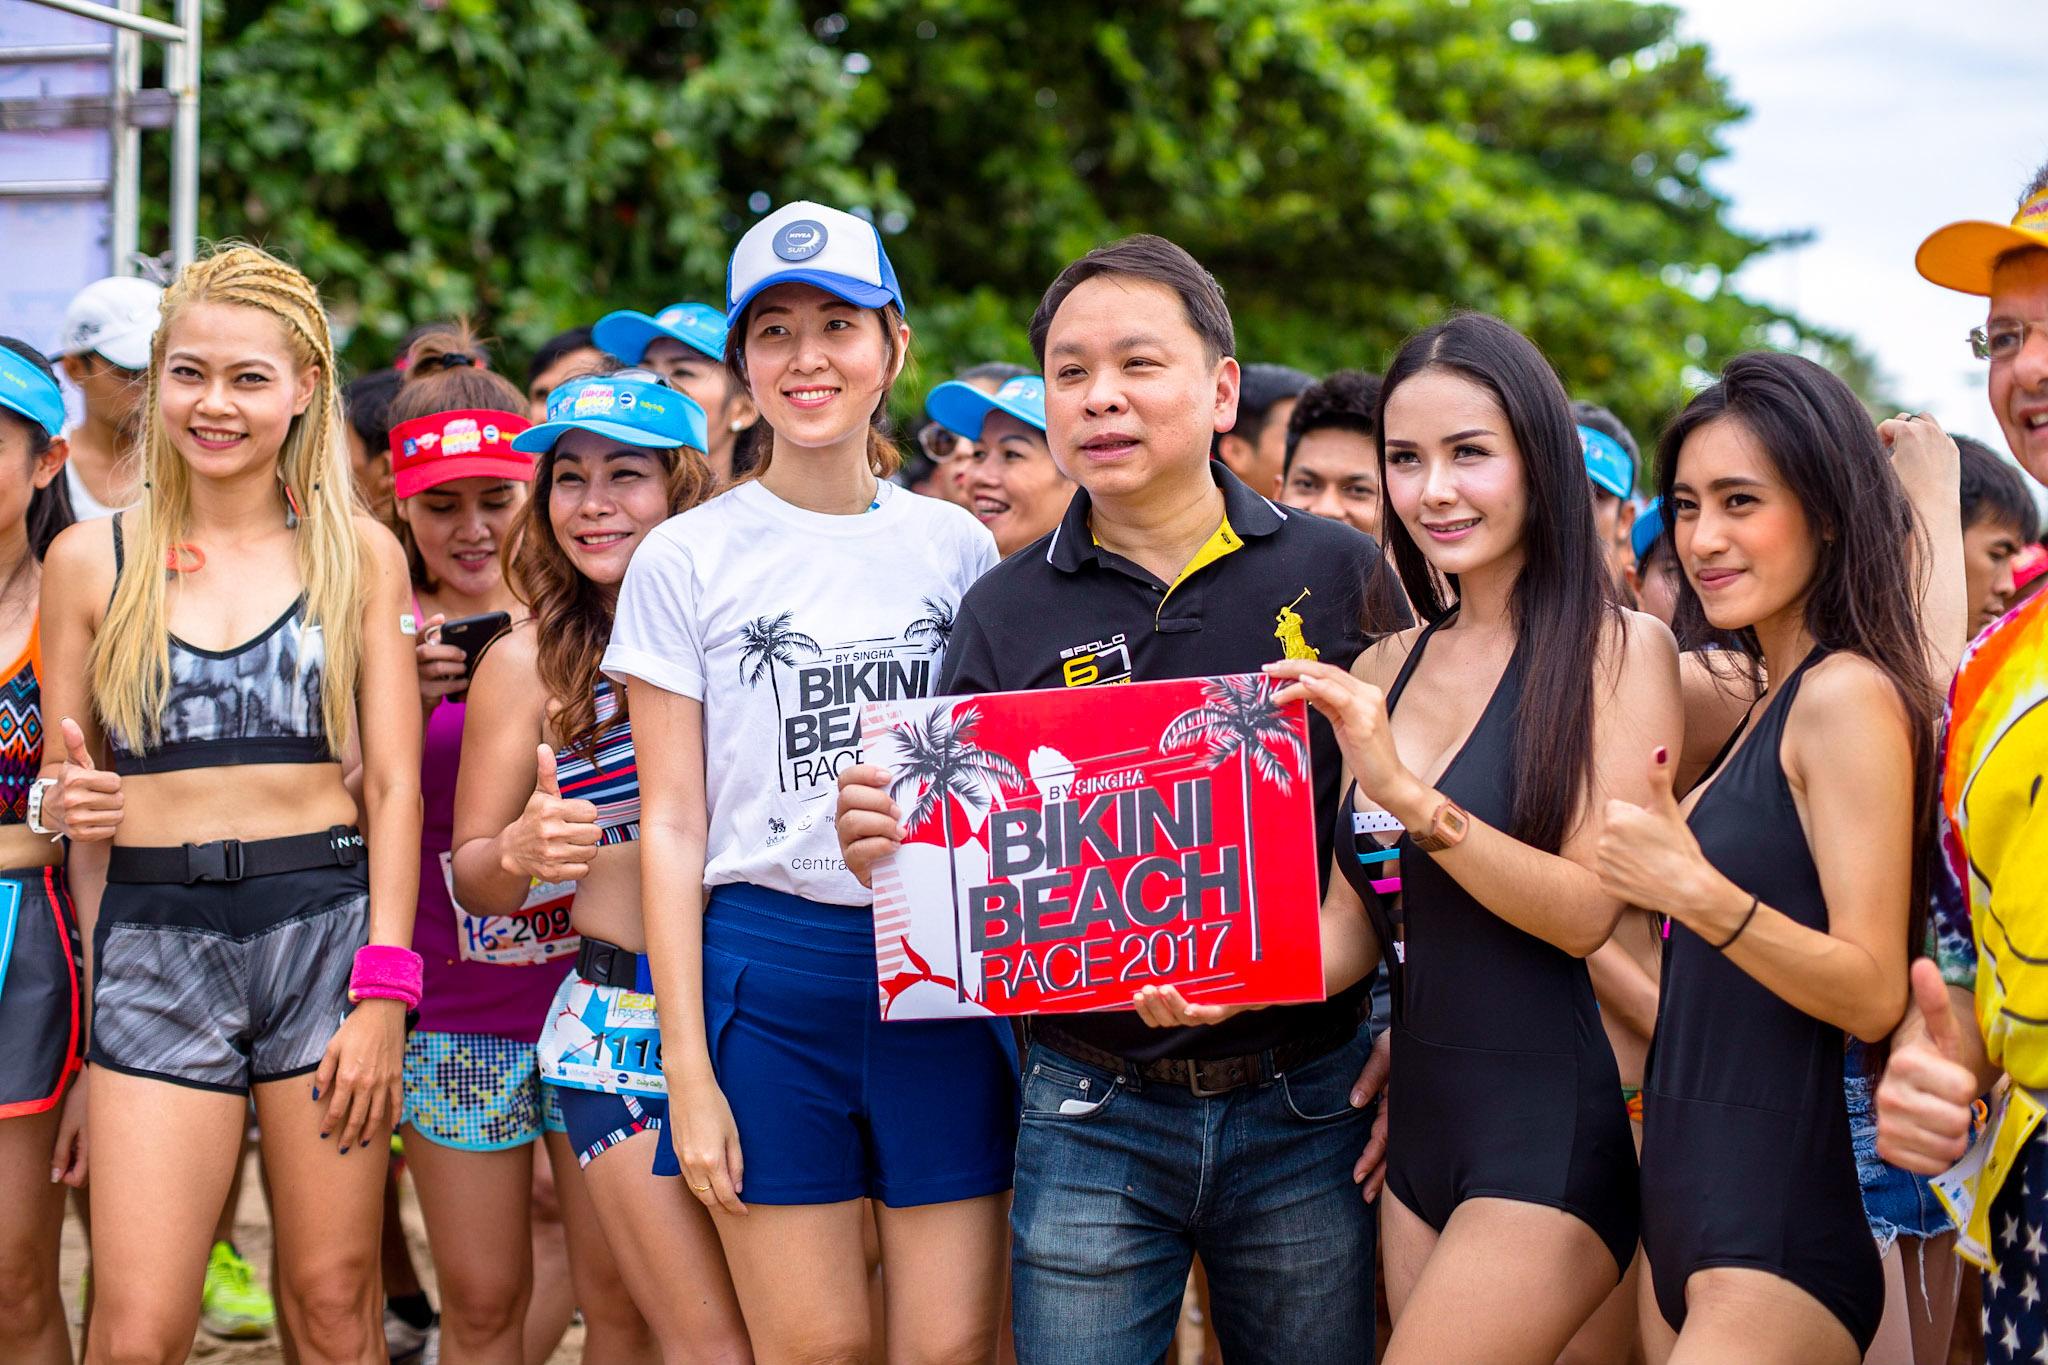 bikini beach race 2017